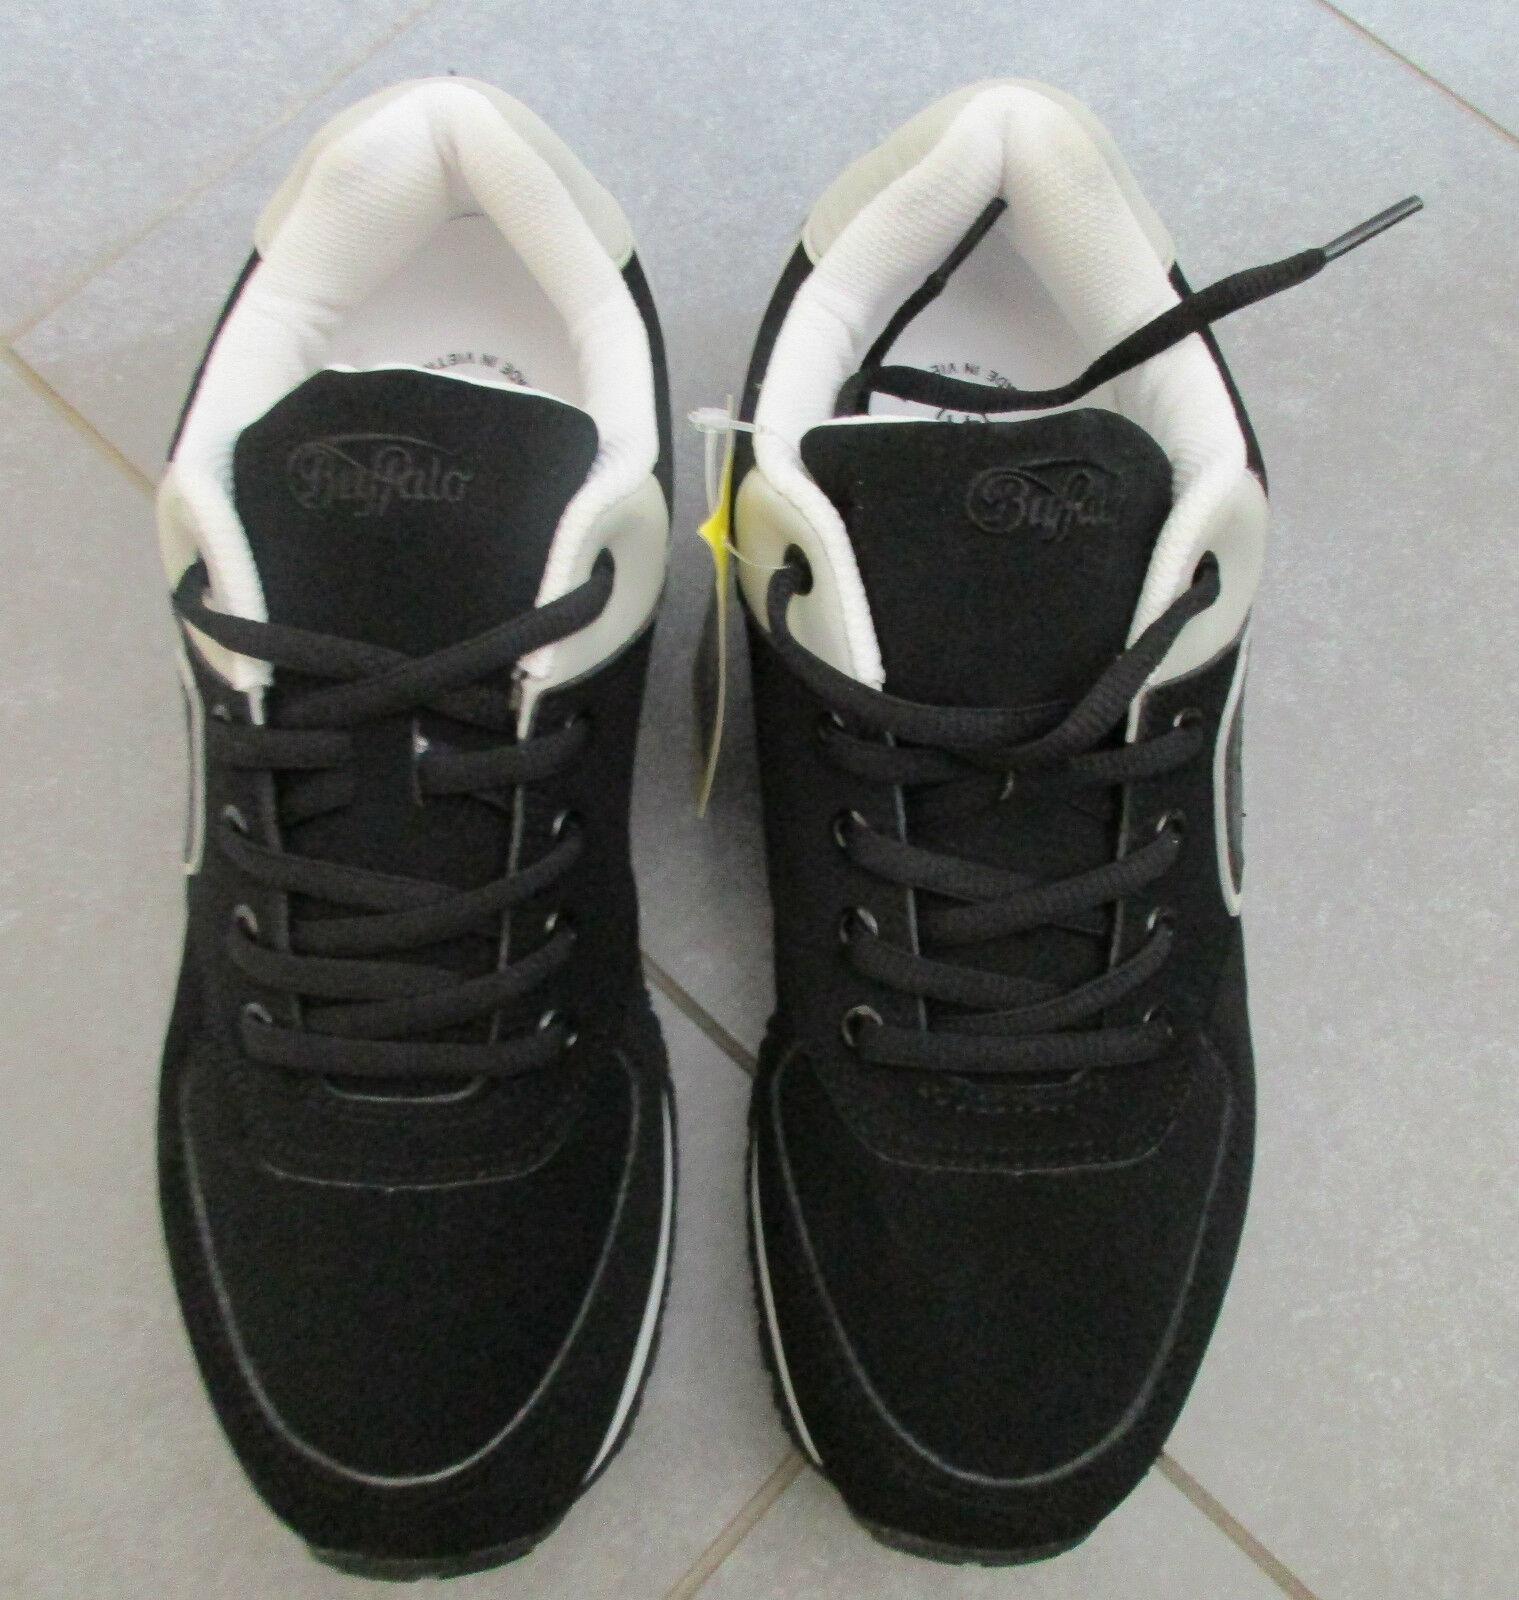 Buffalo Schuhe Schnürschuhe Sneaker sportlich schwarz weiß Gr. 41 Sportschuh